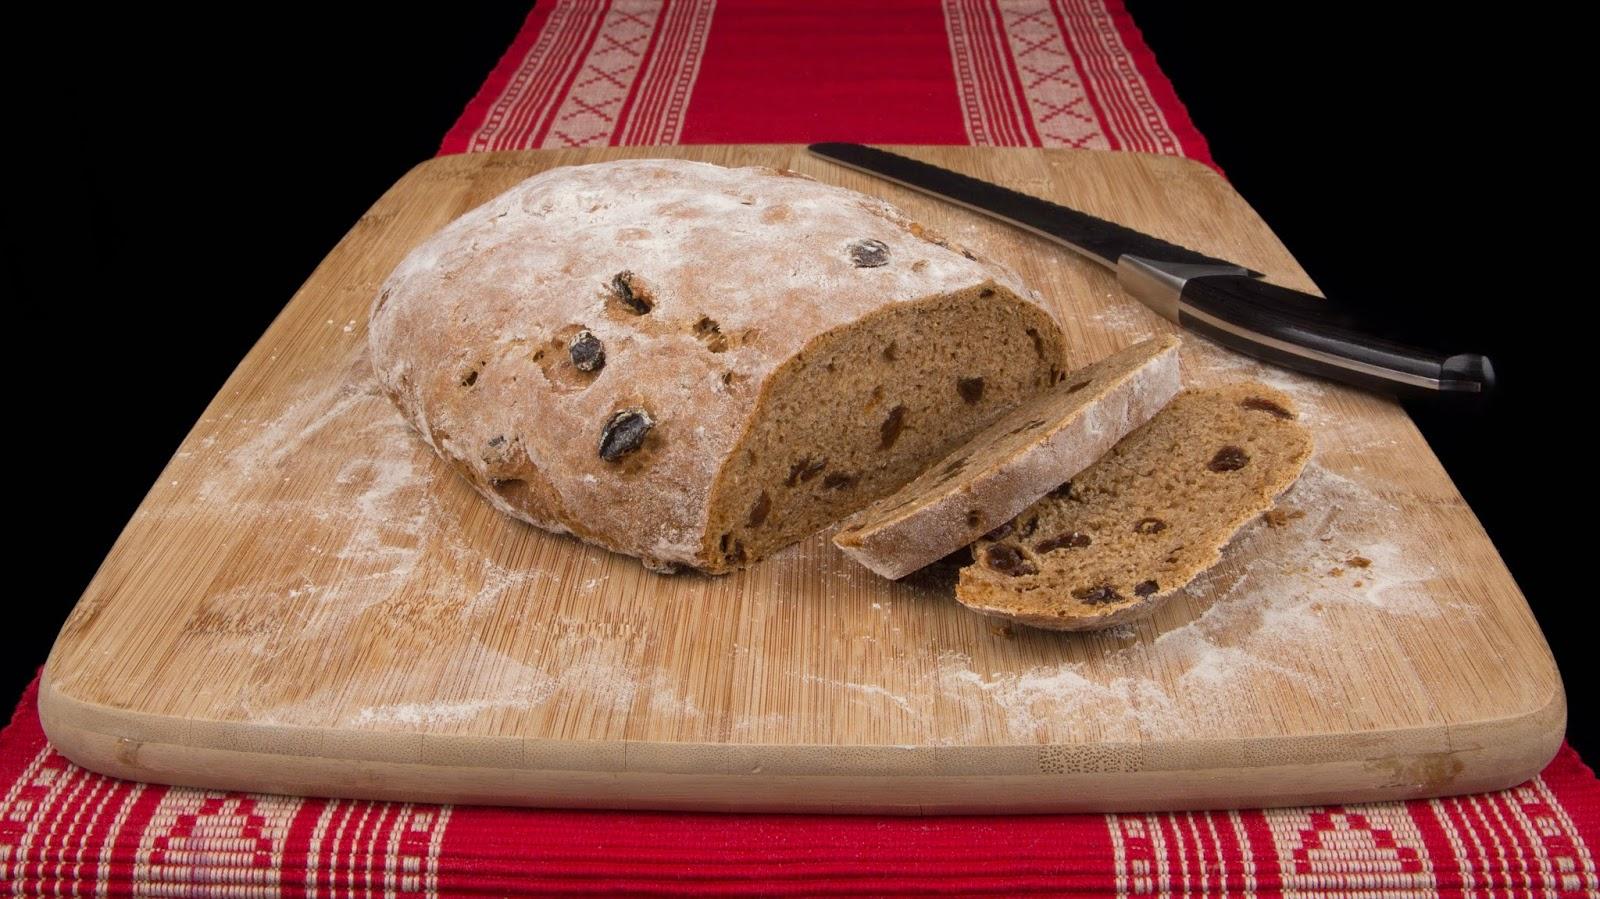 Swedish Christmas Bread.Making Swedish Christmas Vortbrod Malt Bread In Canada The Food